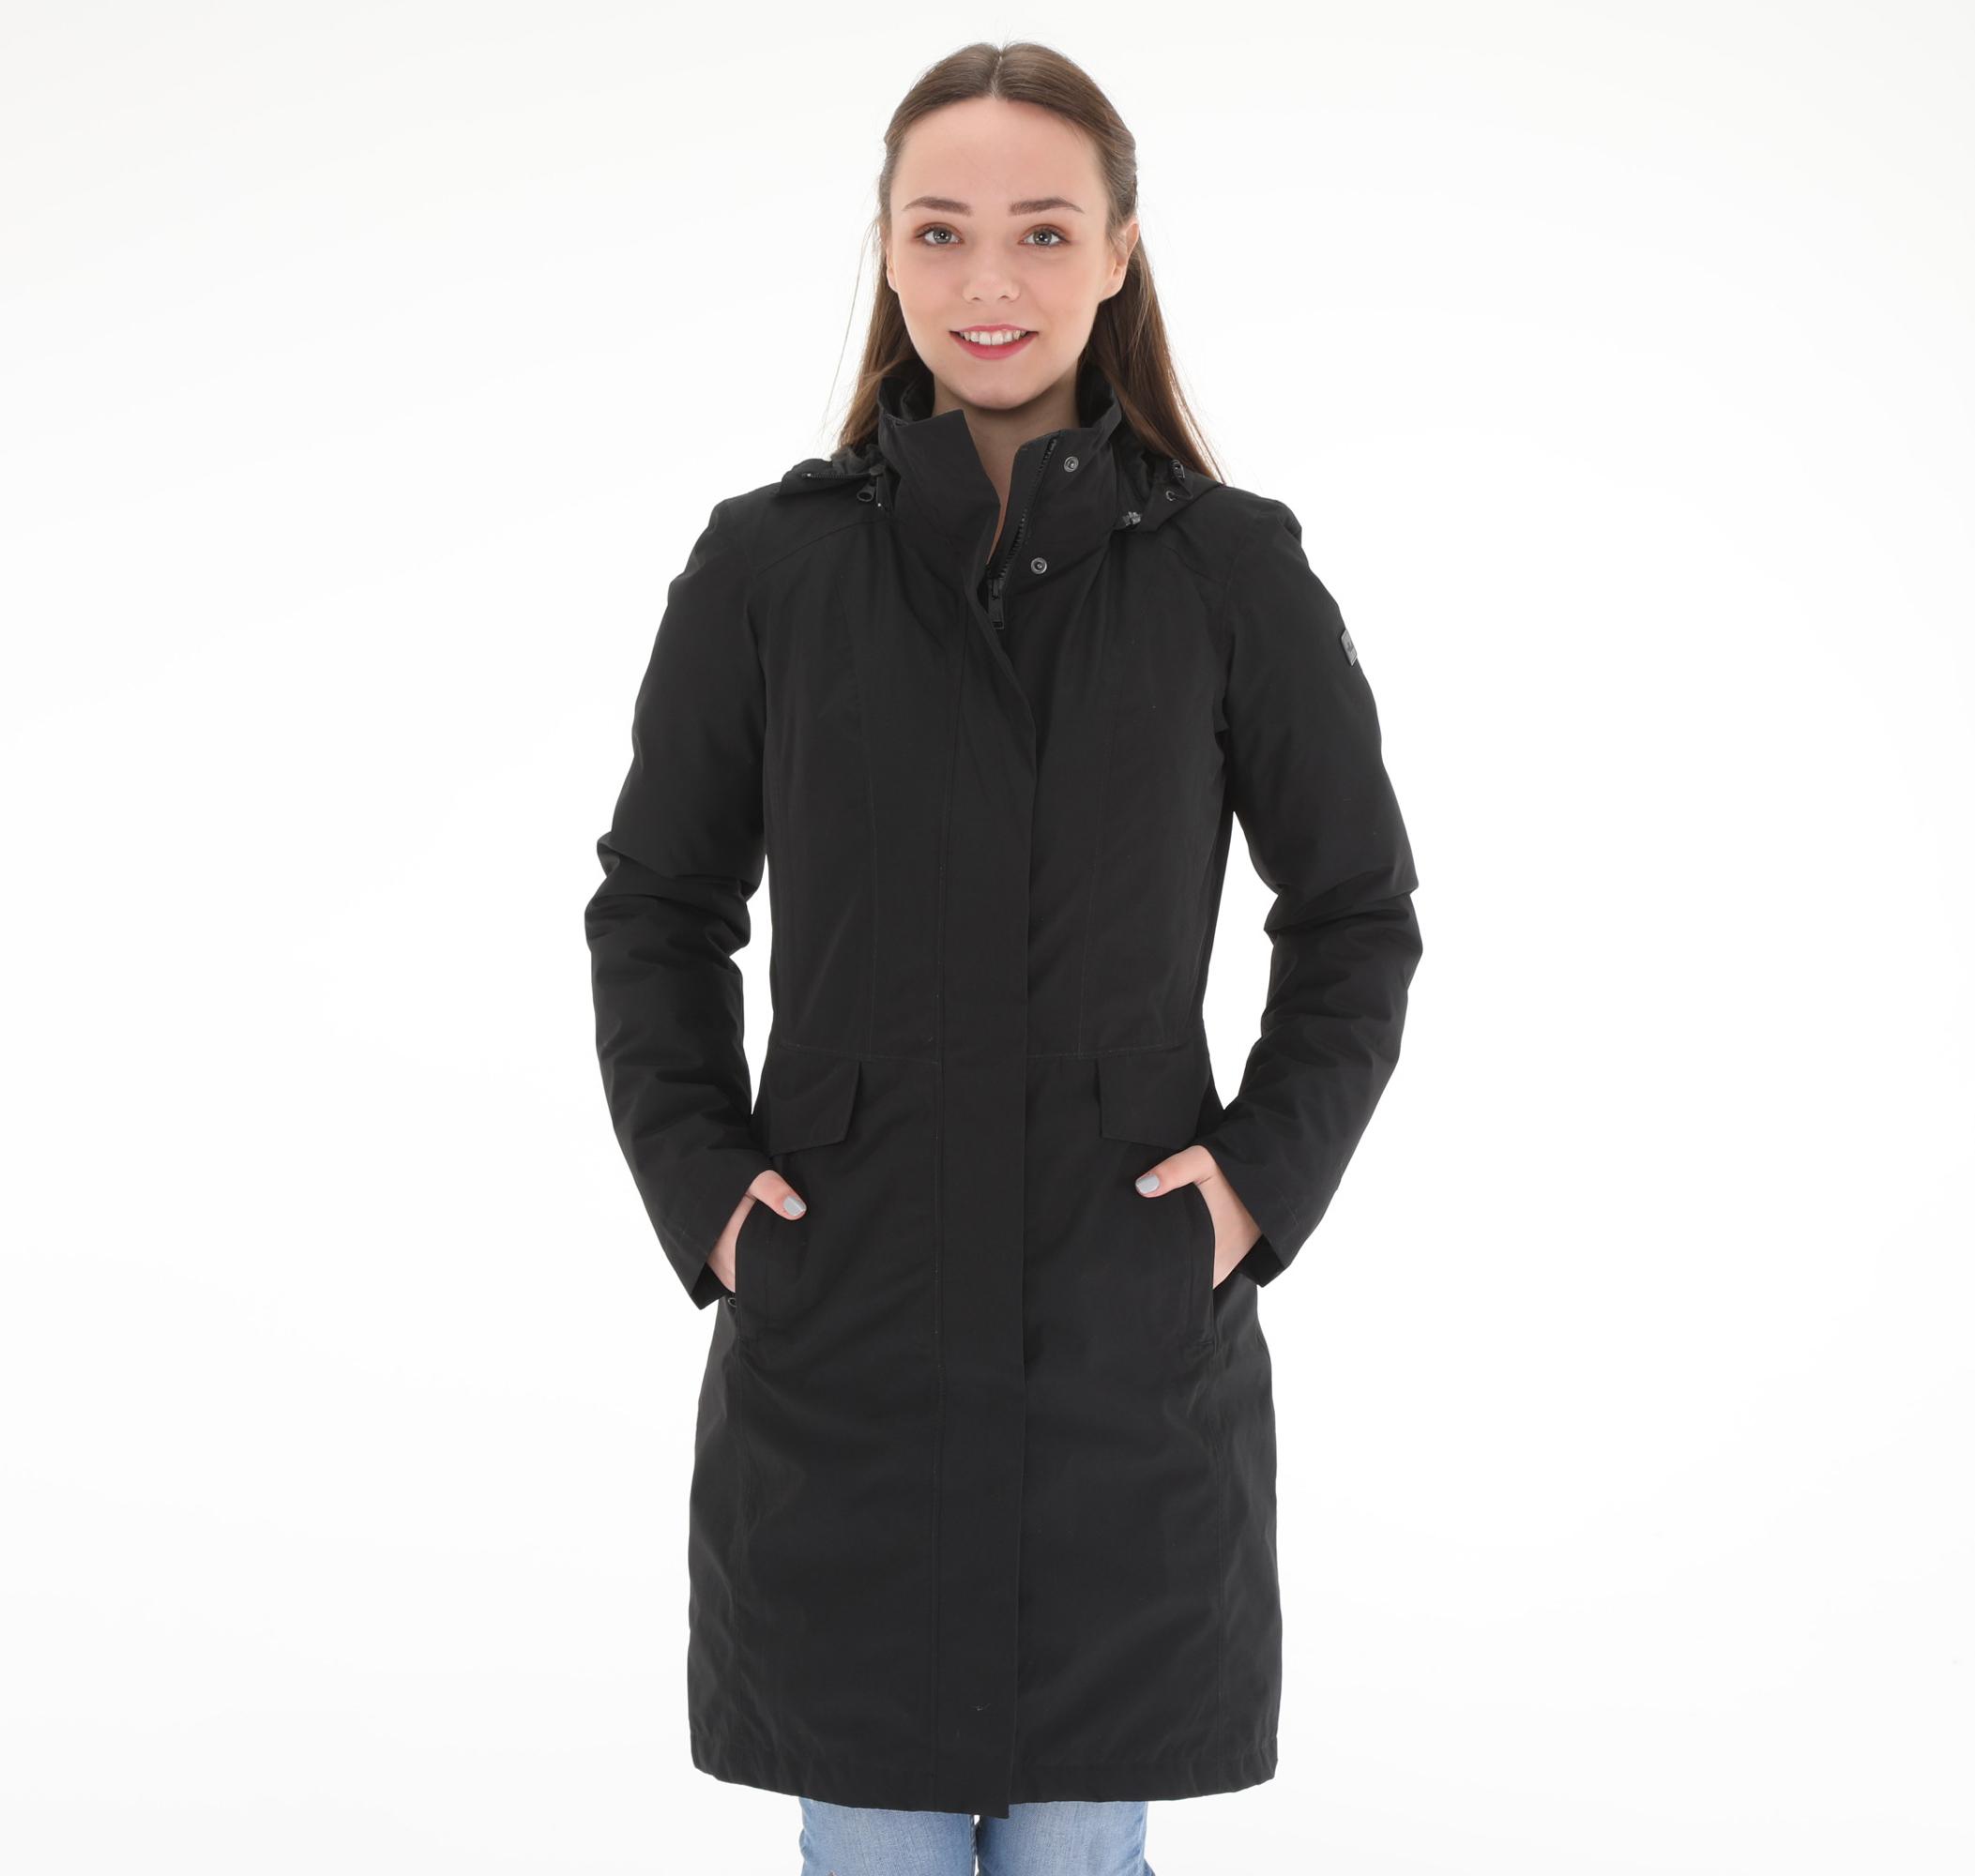 W Suzanne Trıclımate Jacket Kadın Mont Siyah